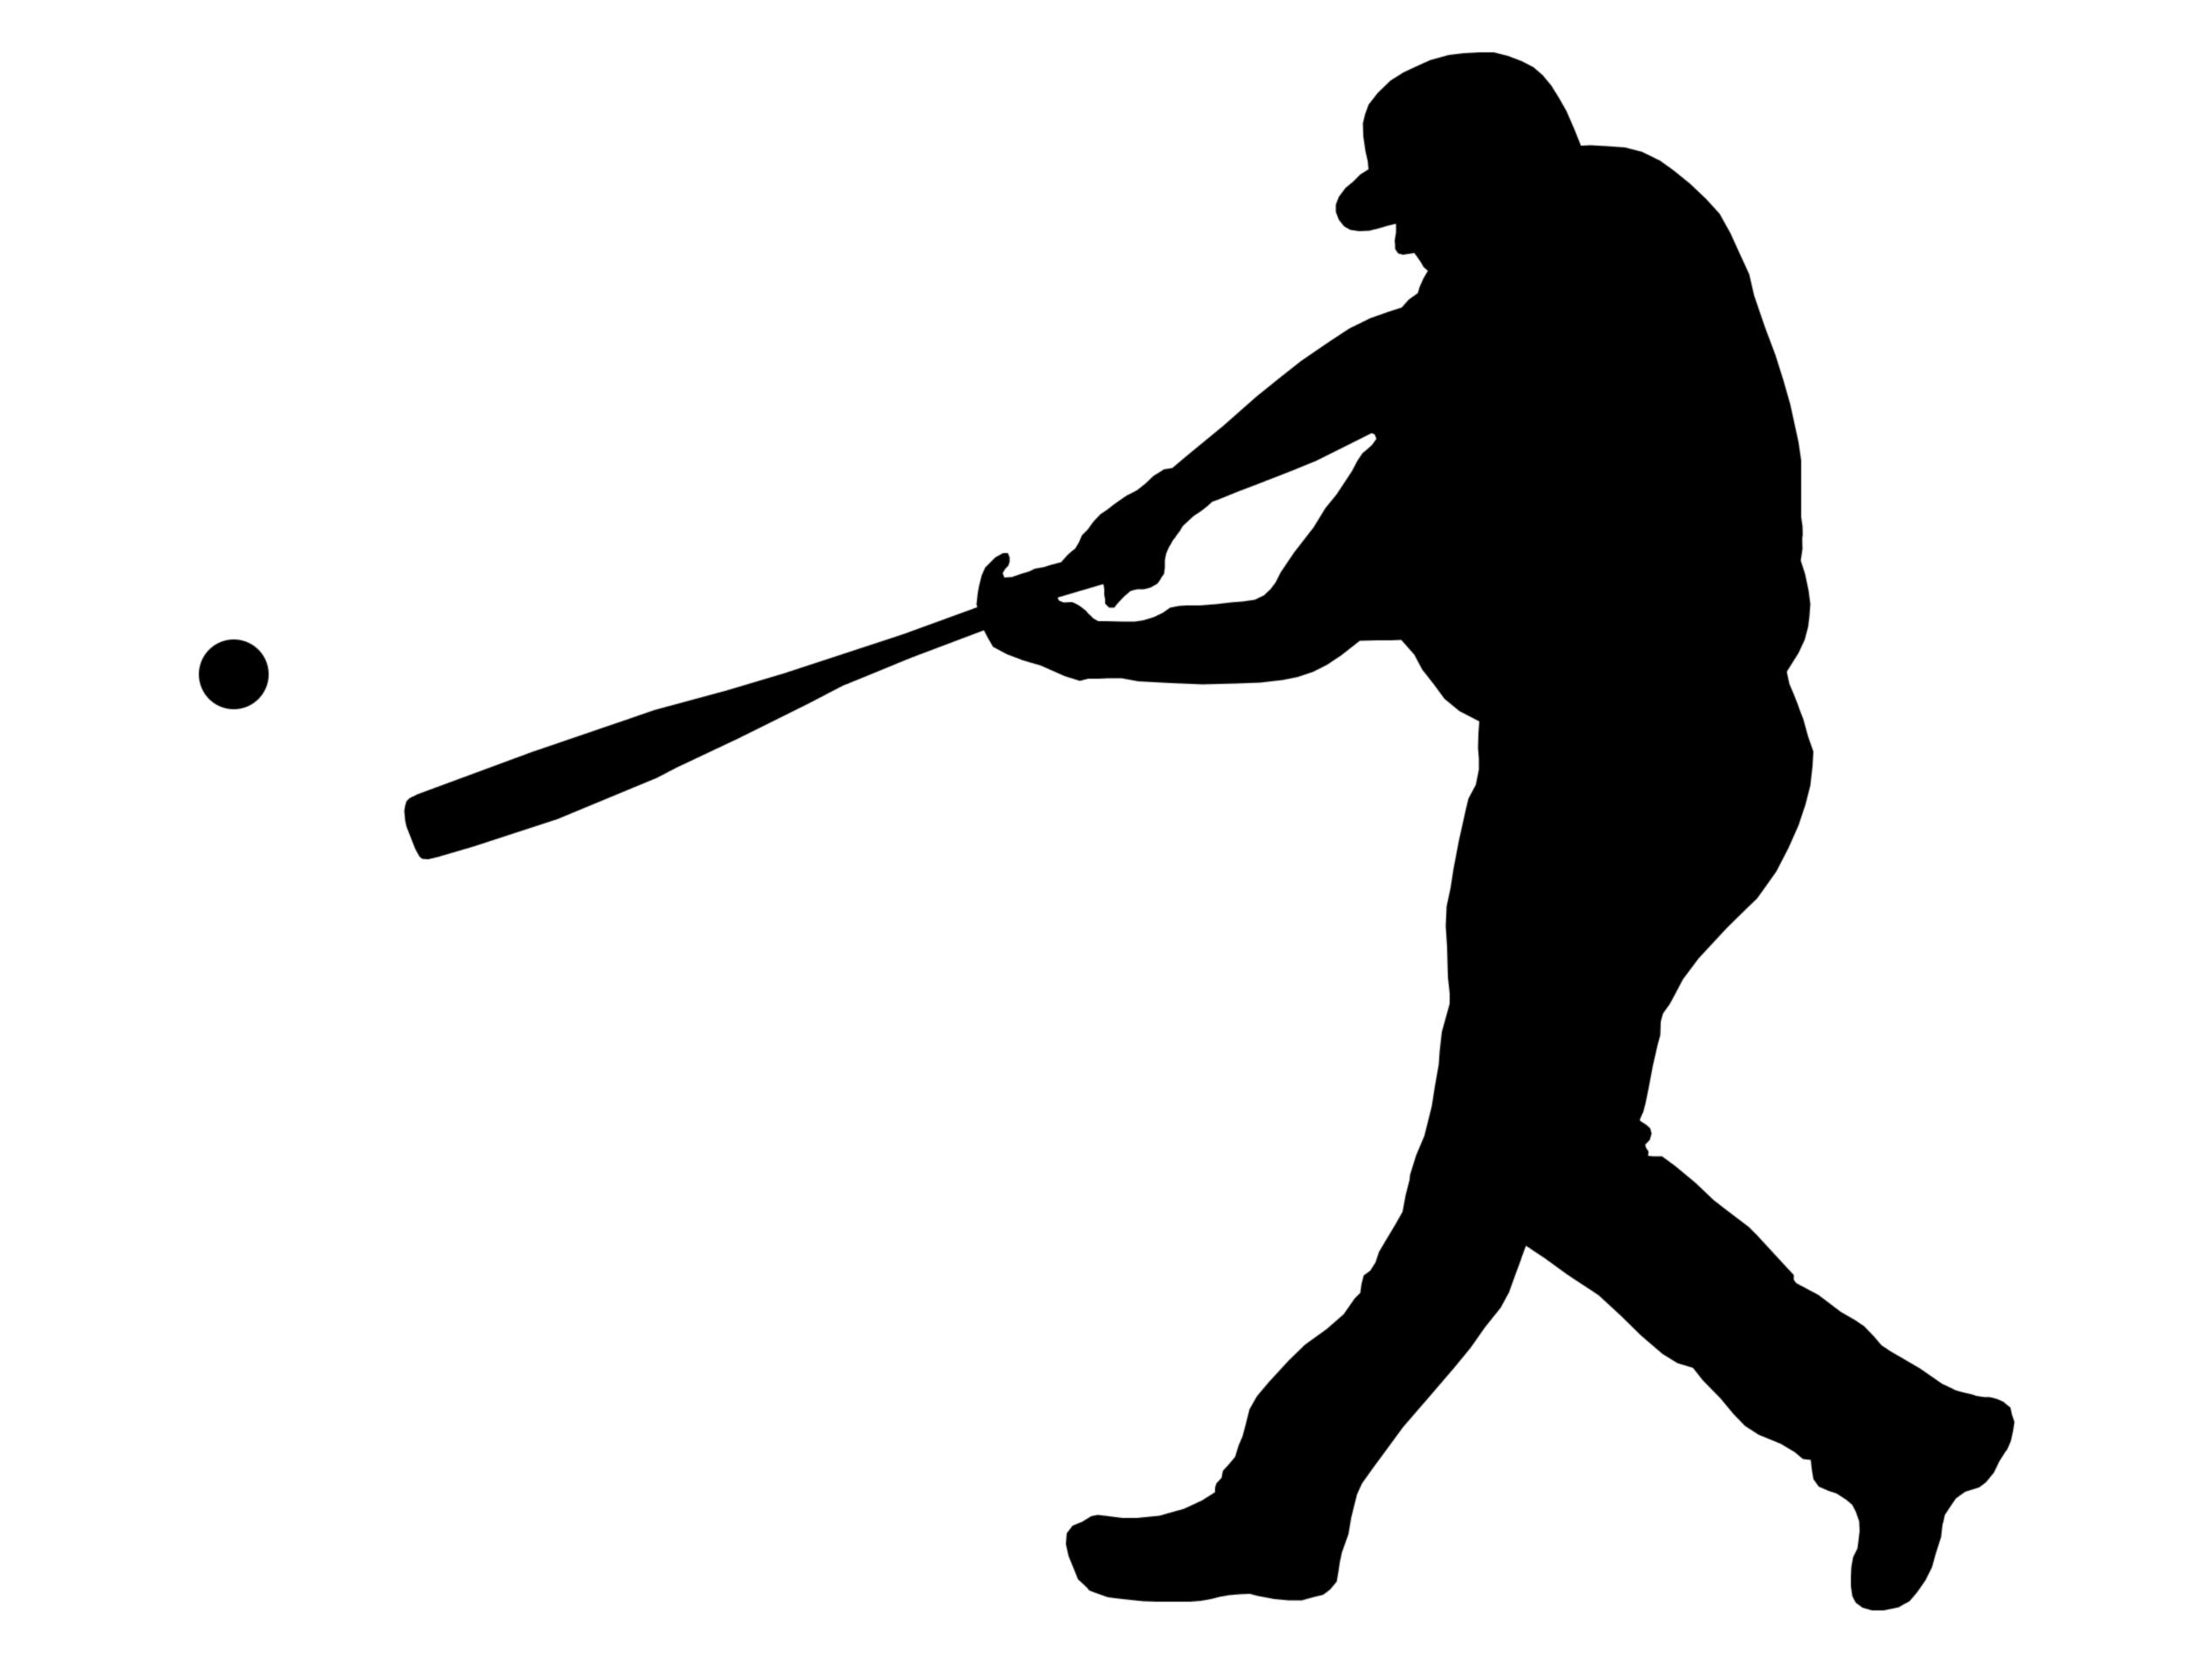 Clip art panda free. Baseball clipart home run